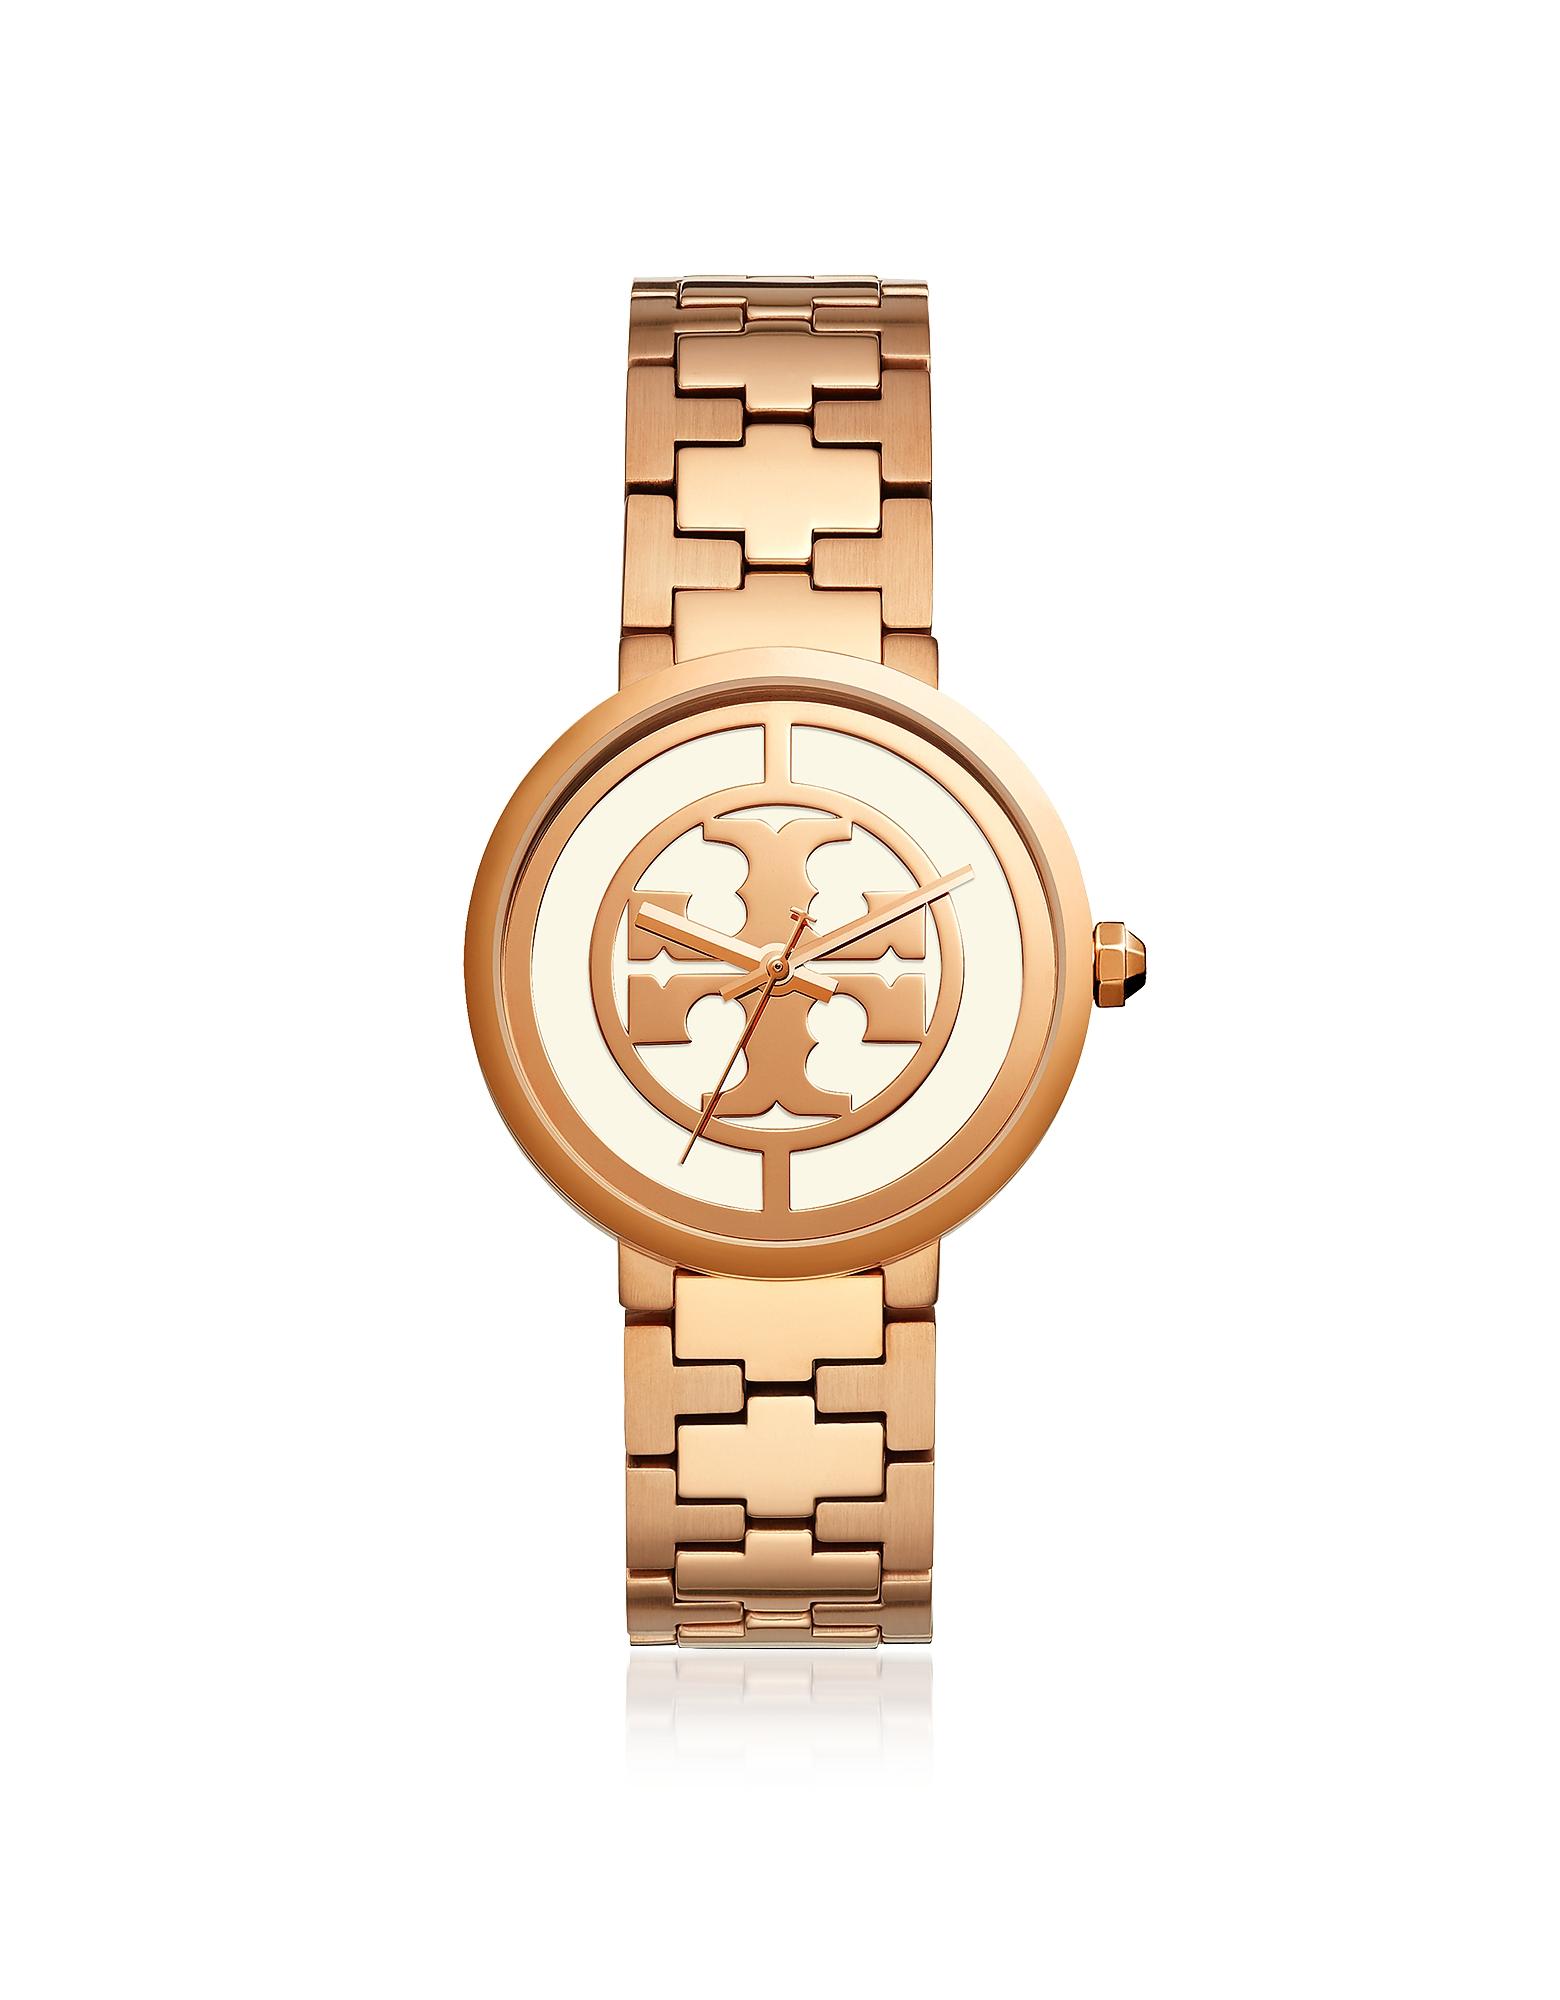 Tory Burch TBW4028 The Reva Rose Gold 36mm Women's Watch